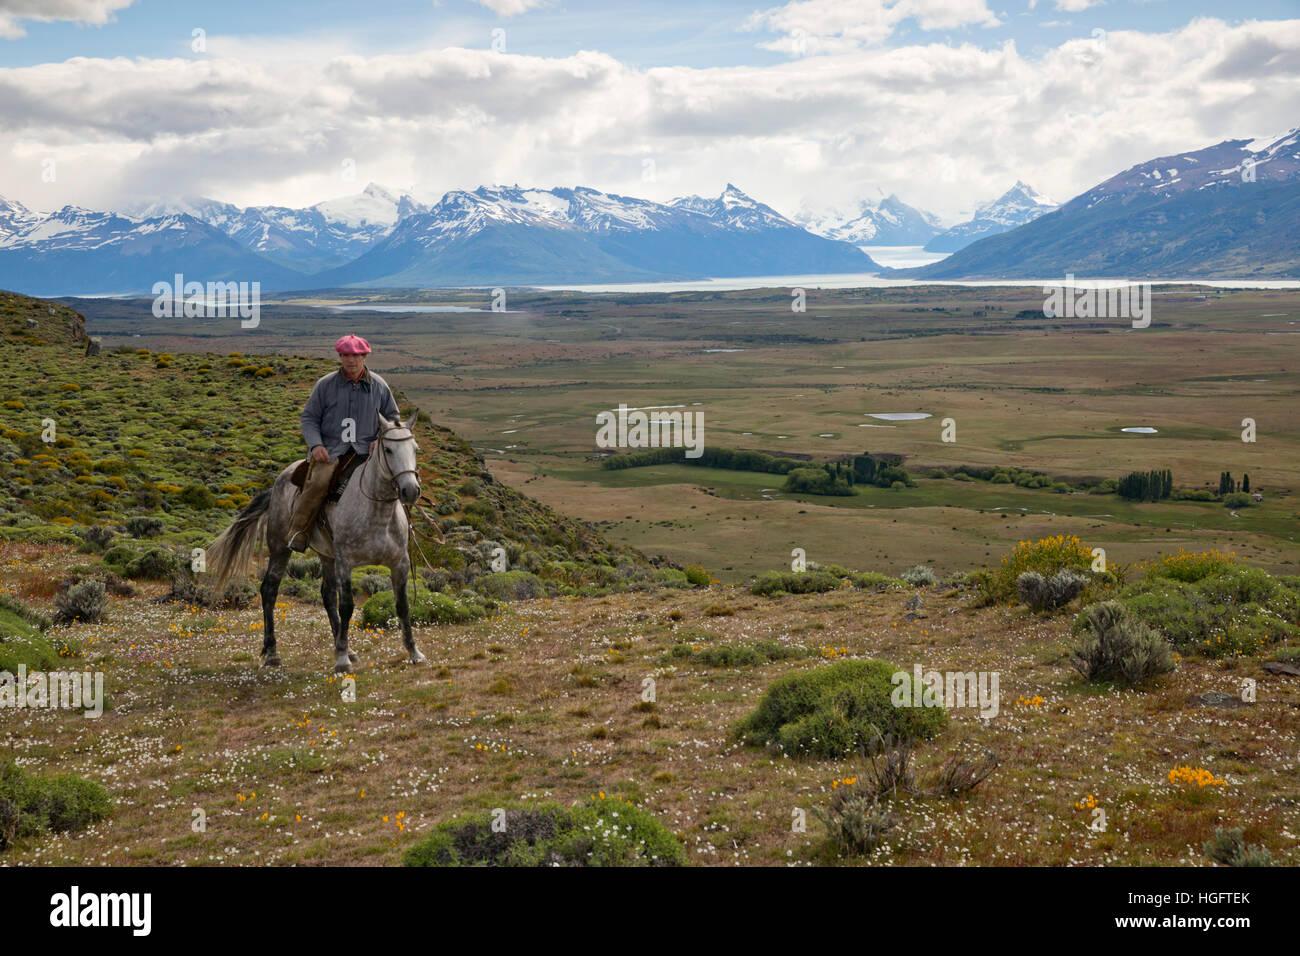 Gaucho sur l'Estancia Alta Vista avec les Andes et Perito Moreno, El Calafate, en Patagonie, Argentine Photo Stock